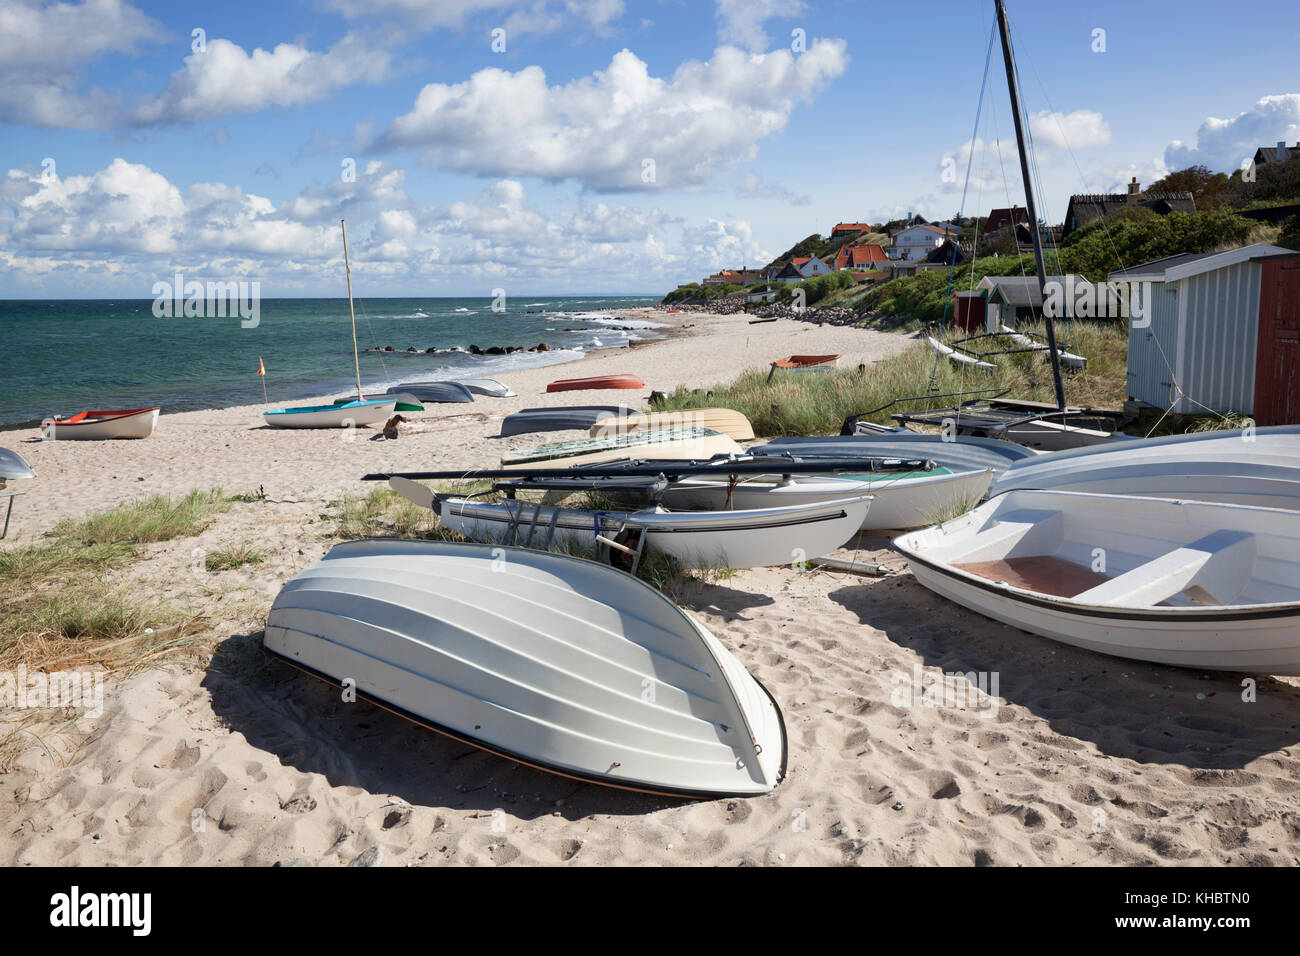 Boats on white sand beach and town behind, Tisvilde, Kattegat Coast, Zealand, Denmark, Europe - Stock Image